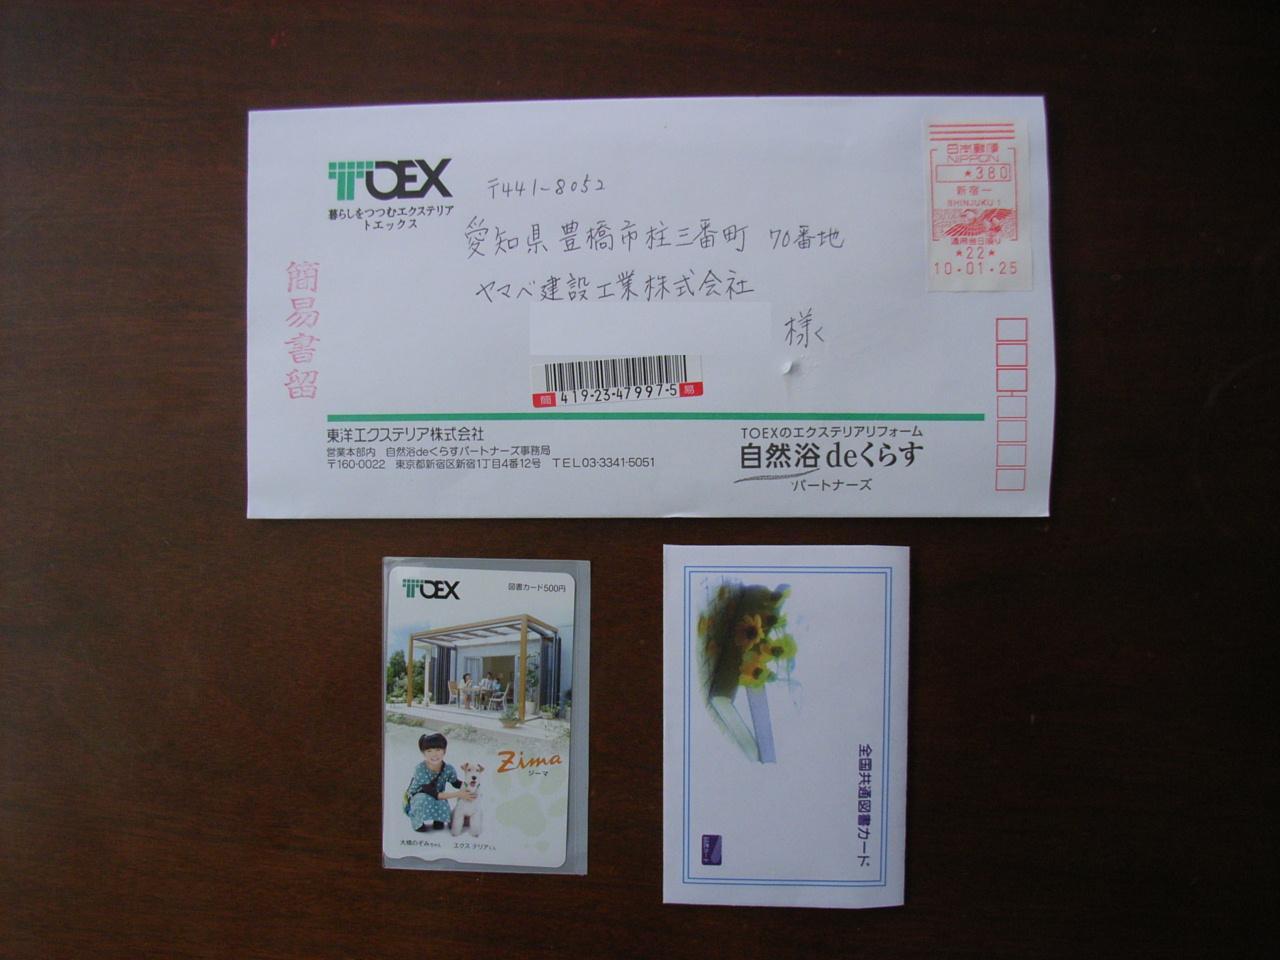 20100129 001